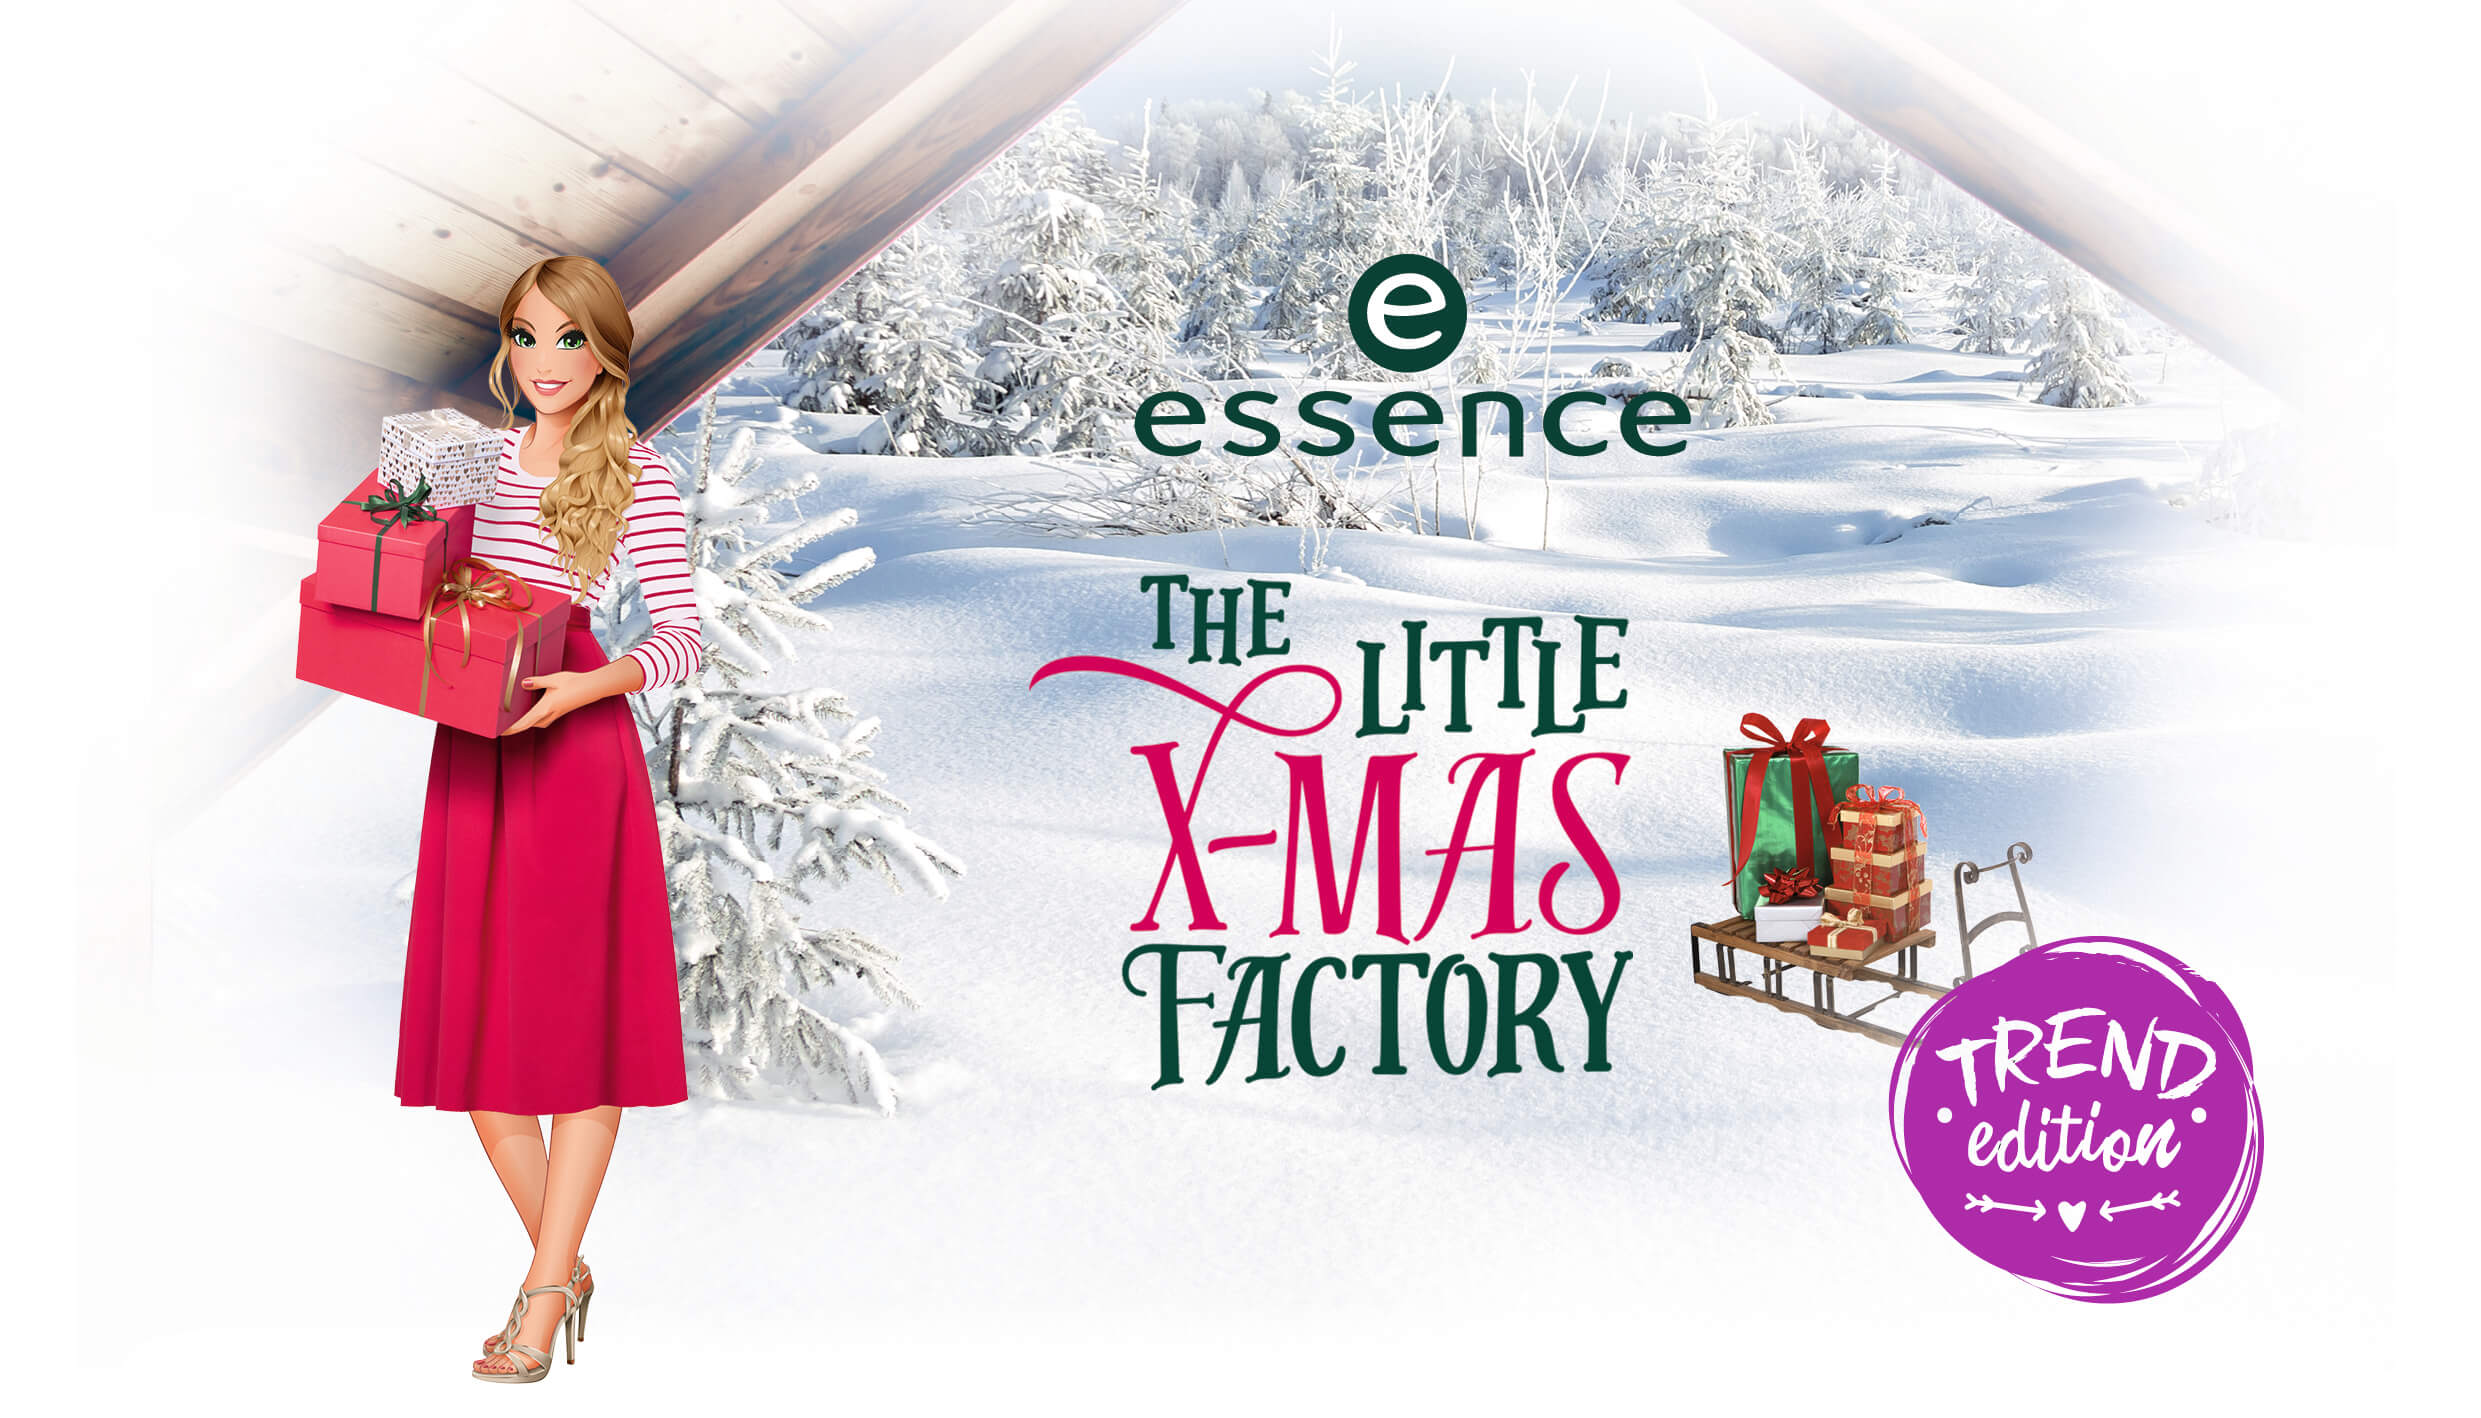 essence_PM_the_little_x-mas_factory_2016_header_1469721695